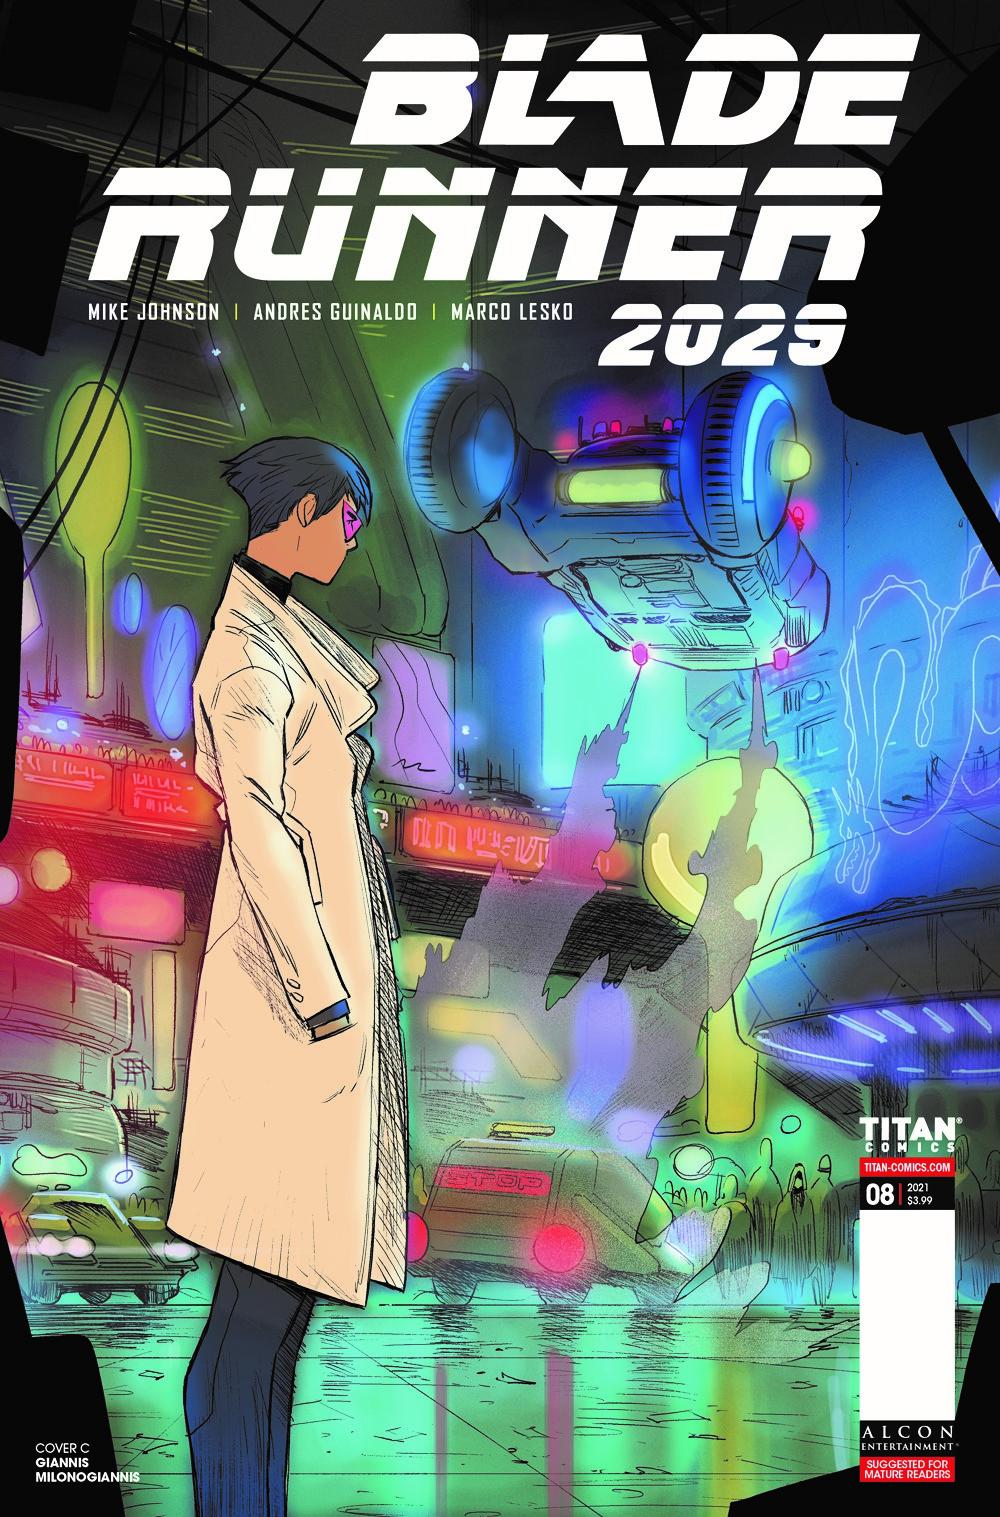 BLADE-RUNNER-2029-8-CVR-C-MILONOGIANNIS-MR ComicList Previews: BLADE RUNNER 2029 #8